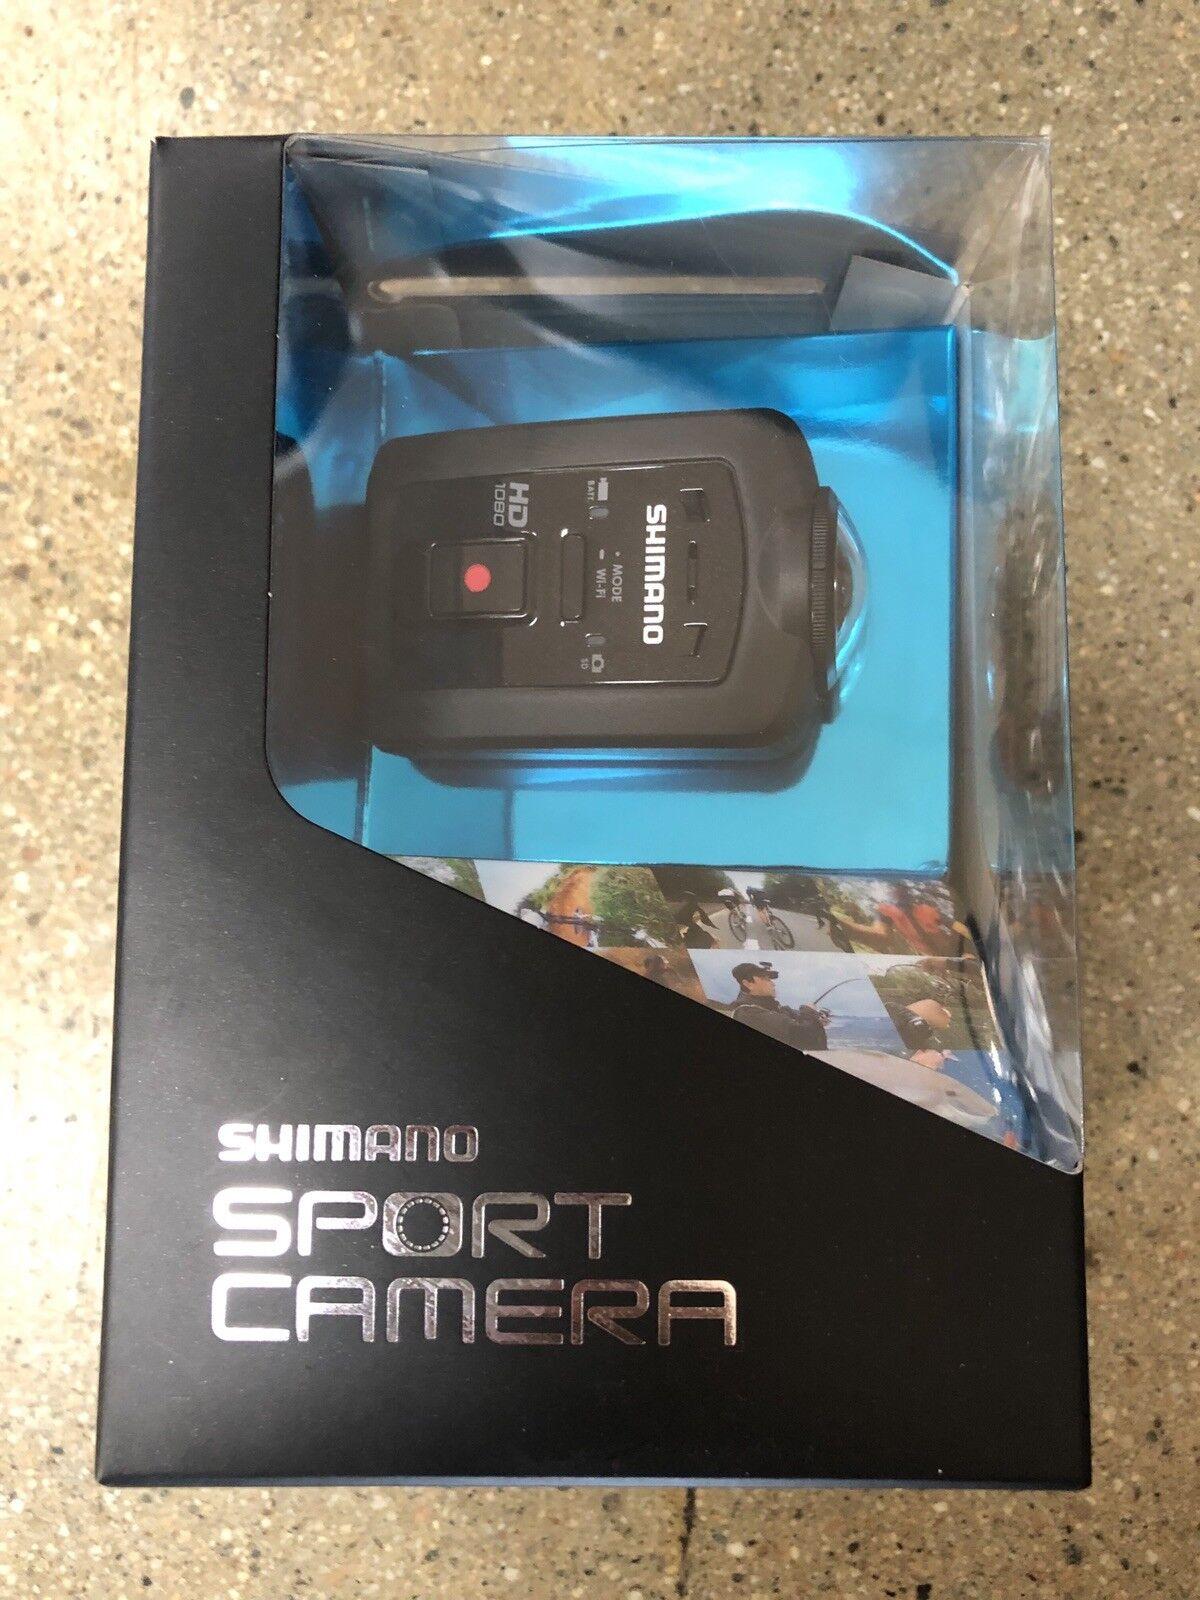 Shimano CM-1000 Sport Camera nib go pro type camera